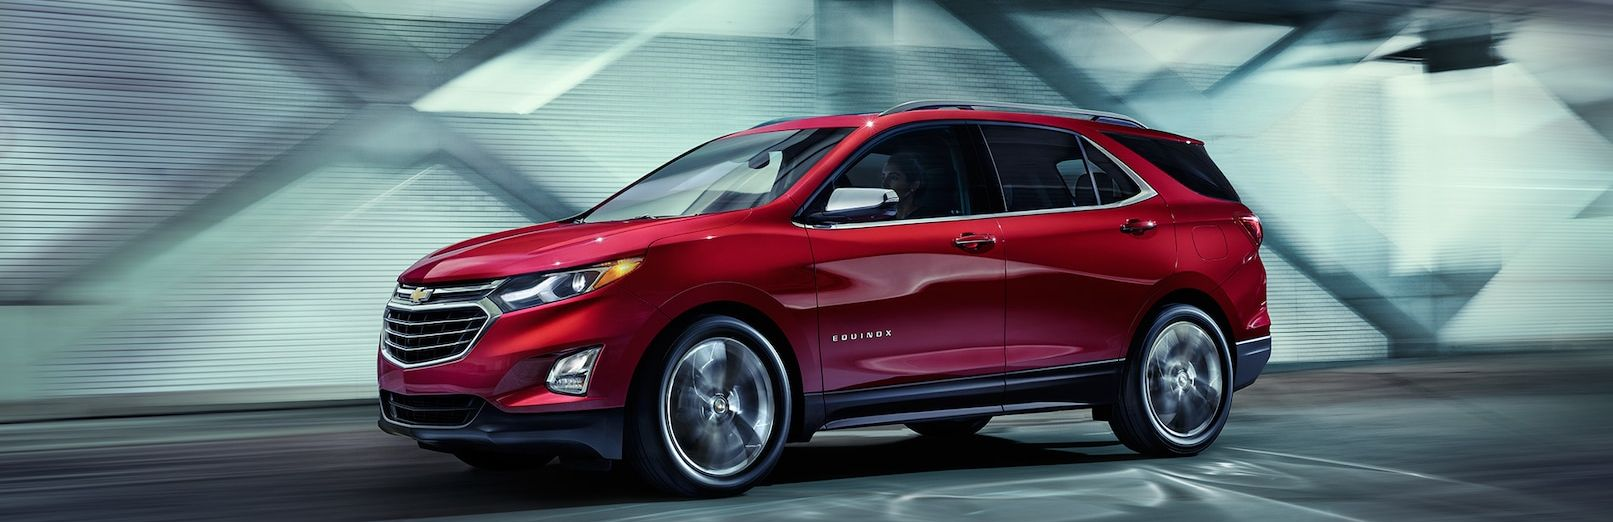 Chevrolet Equinox 2019 a la venta cerca de Fairfax, VA